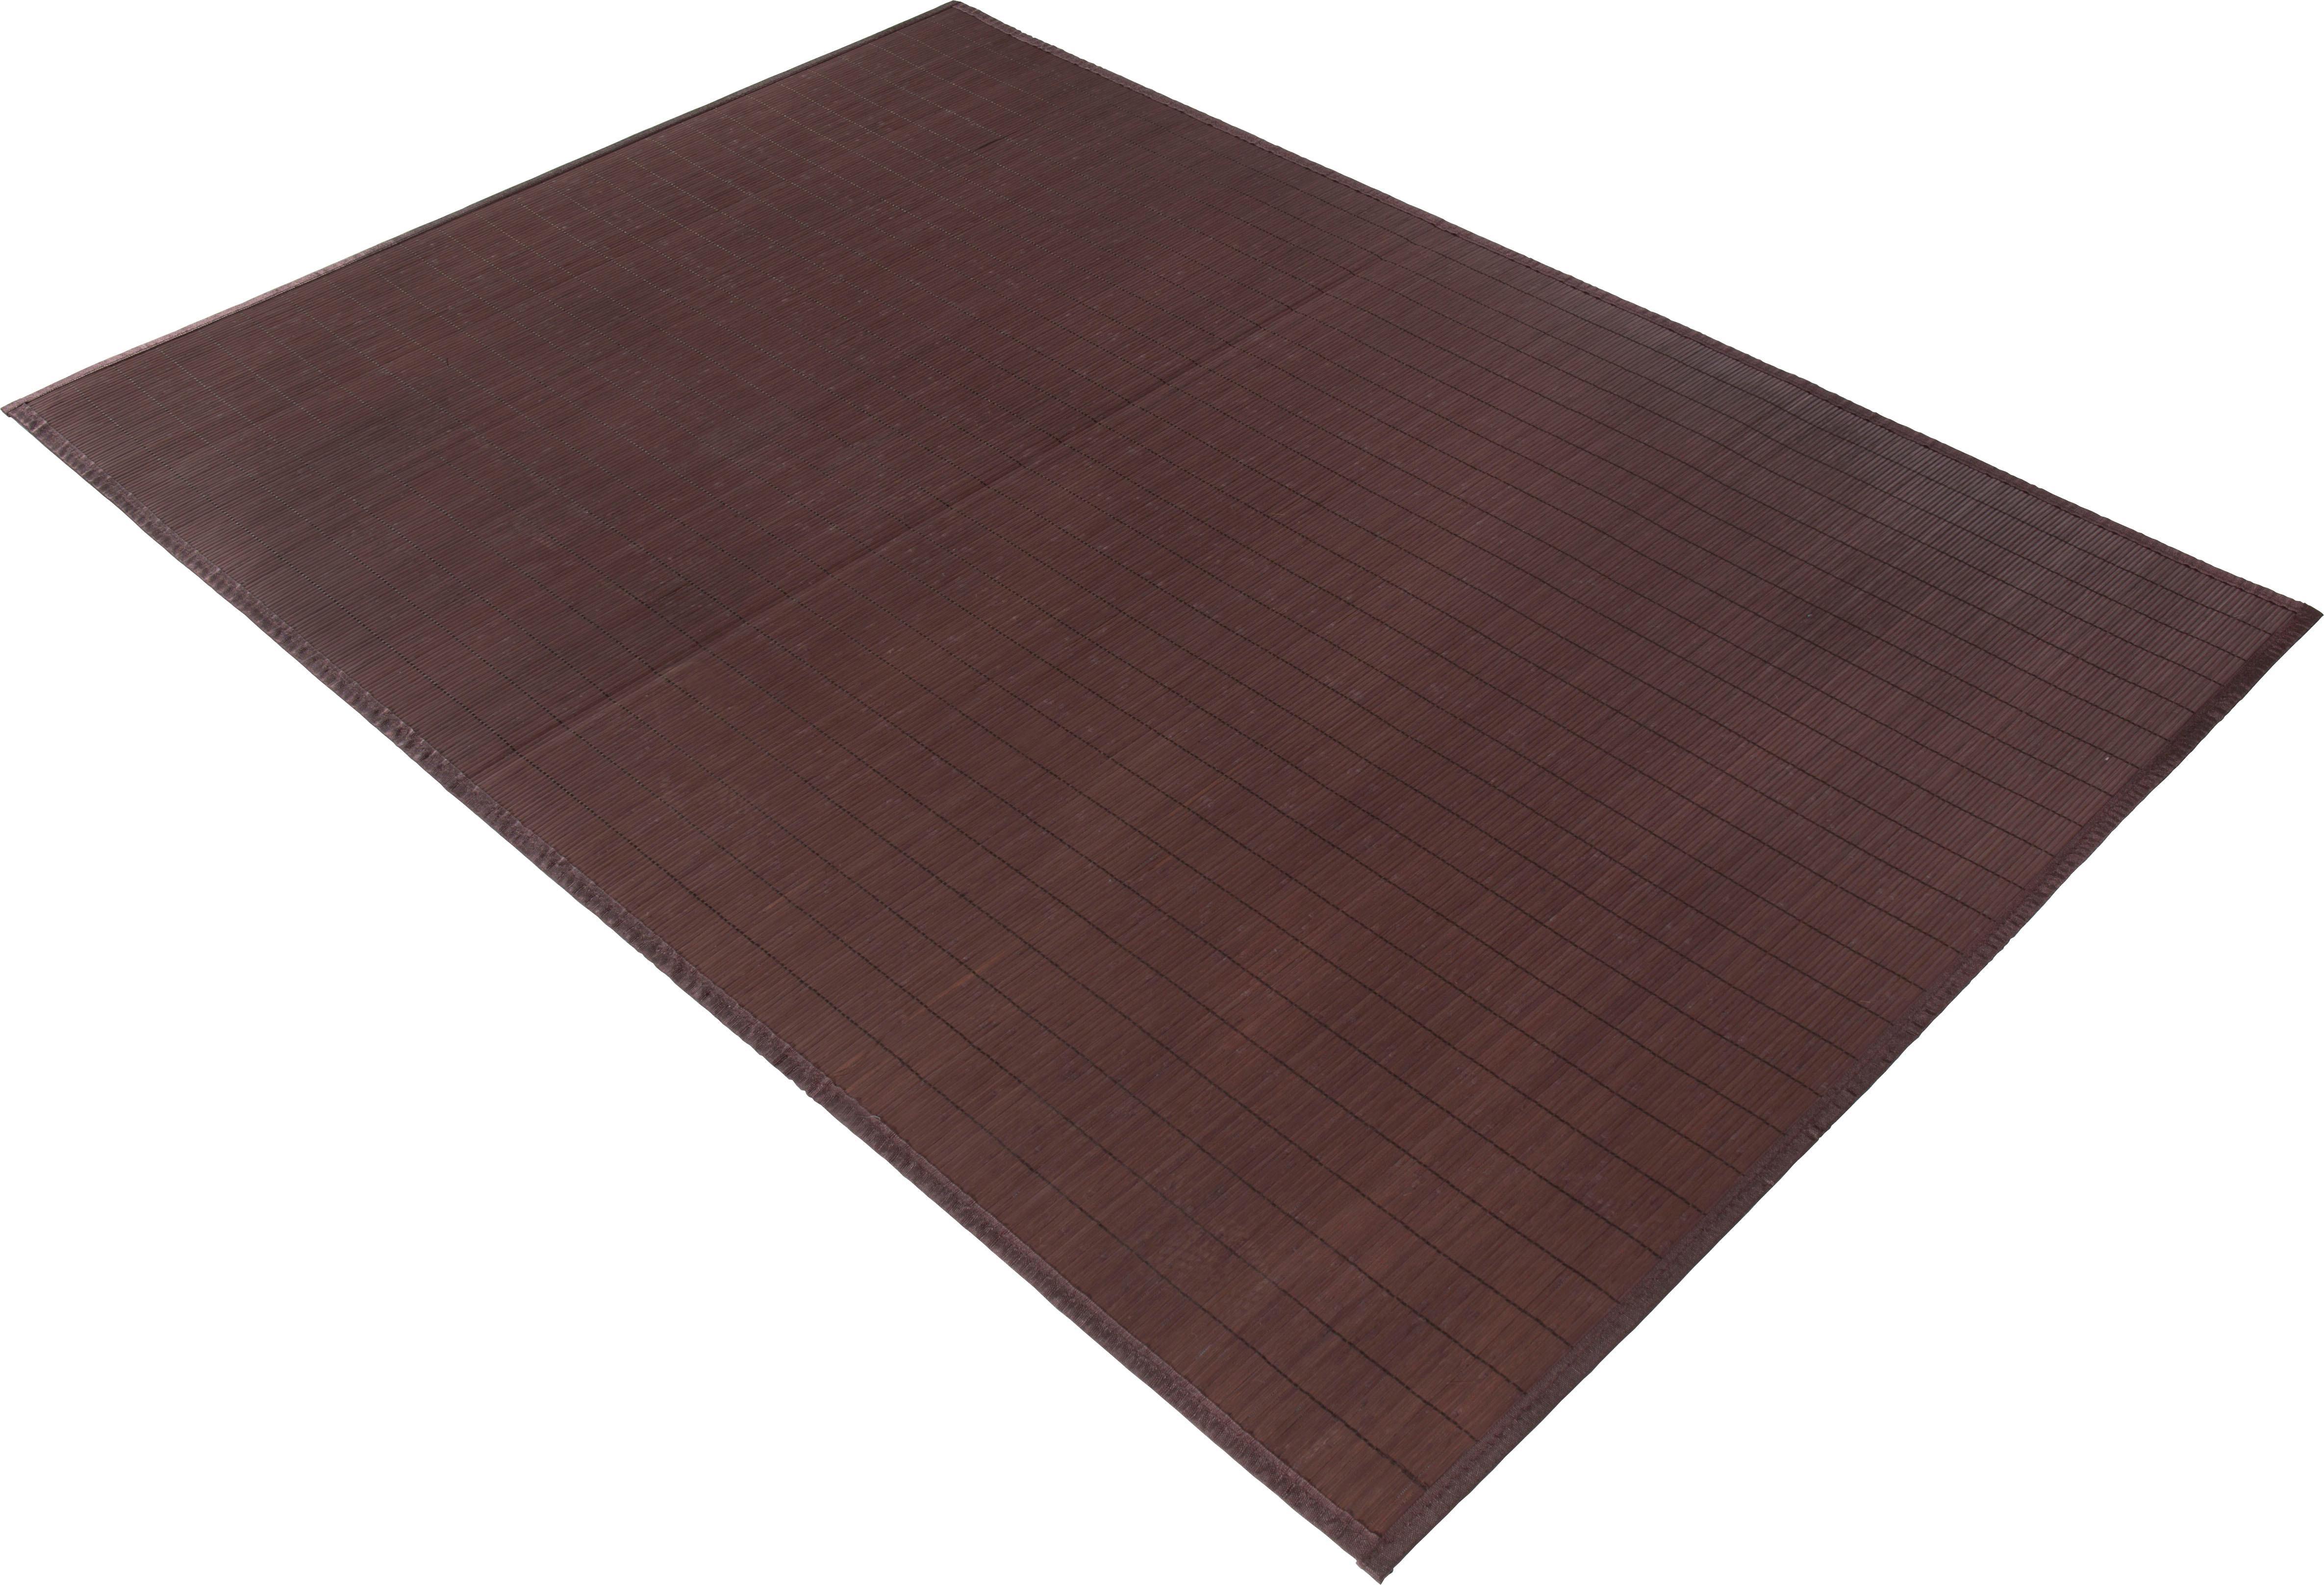 Teppich Bambus 2 Andiamo rechteckig Höhe 5 mm